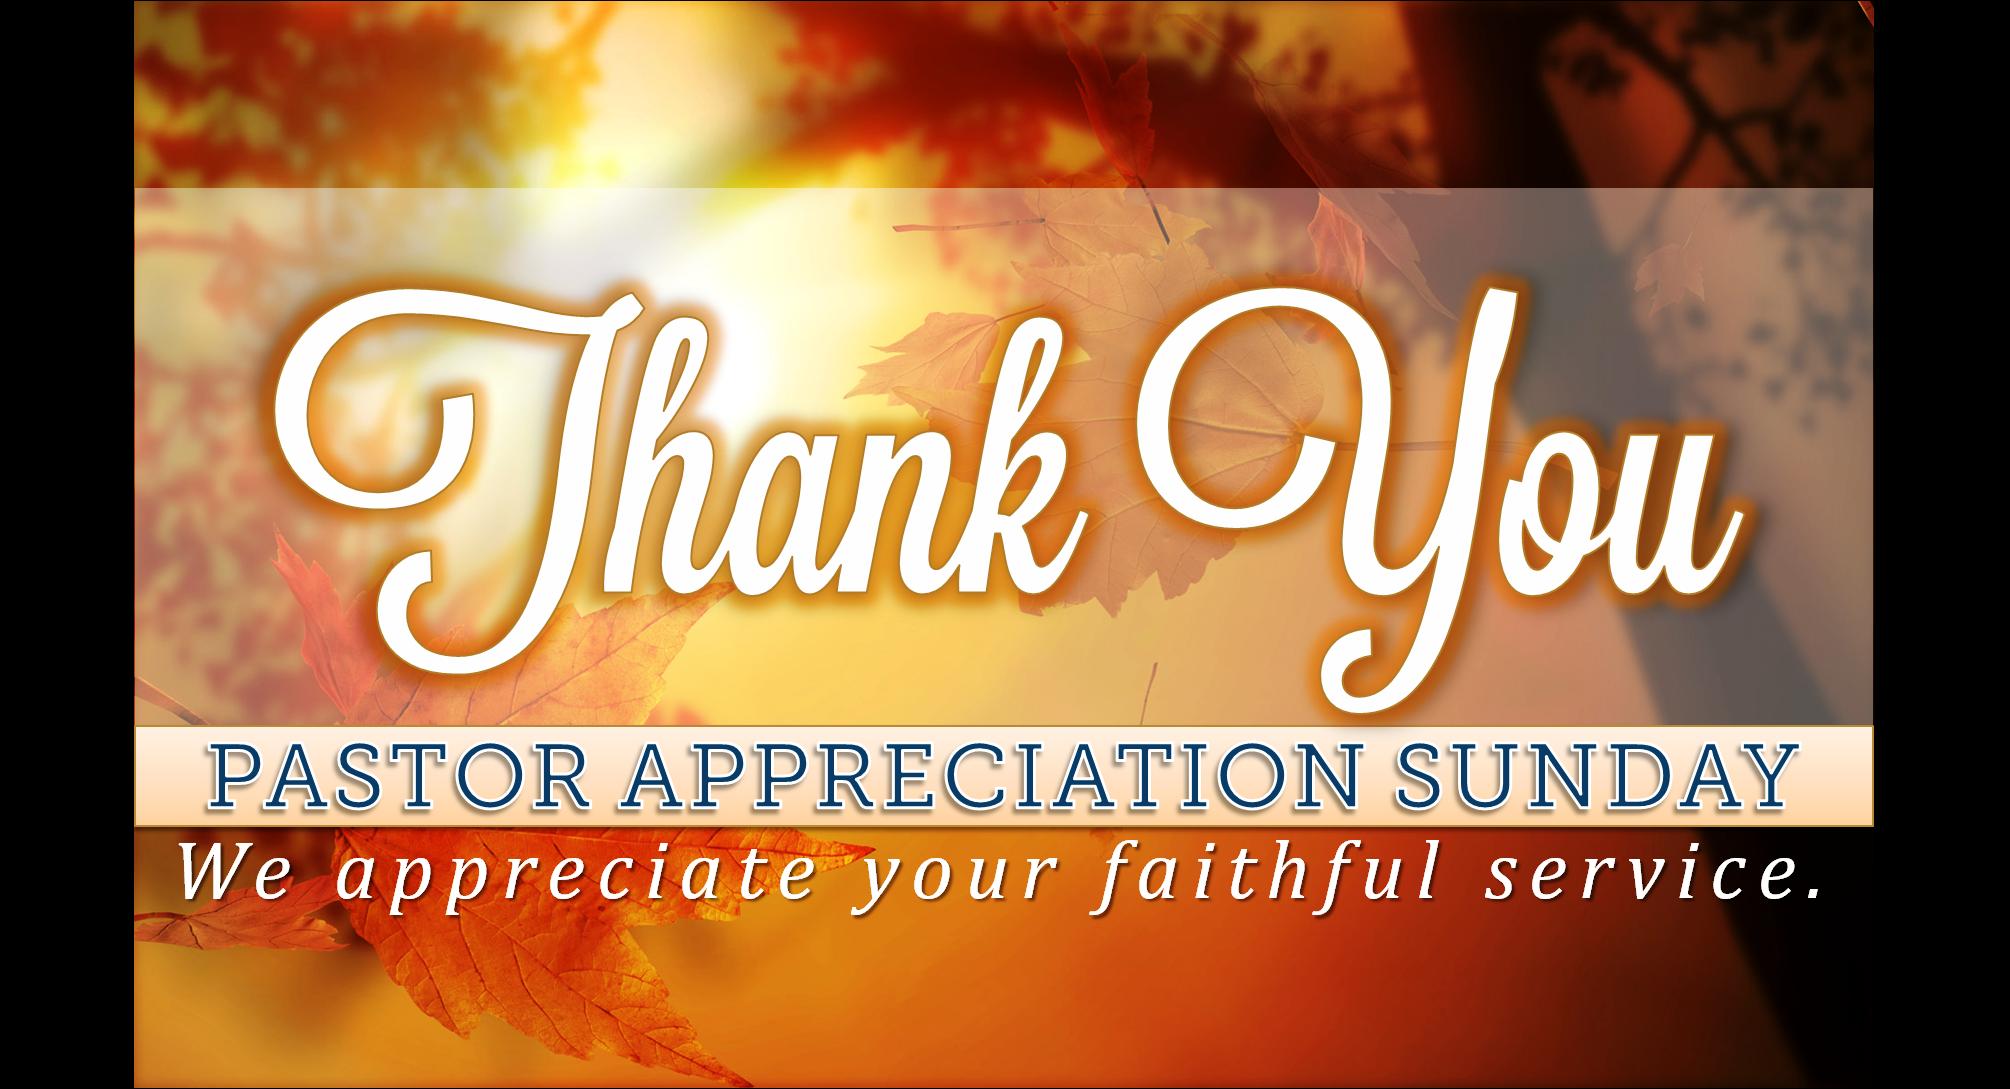 Slide for Pastor Appreciation Sunday.